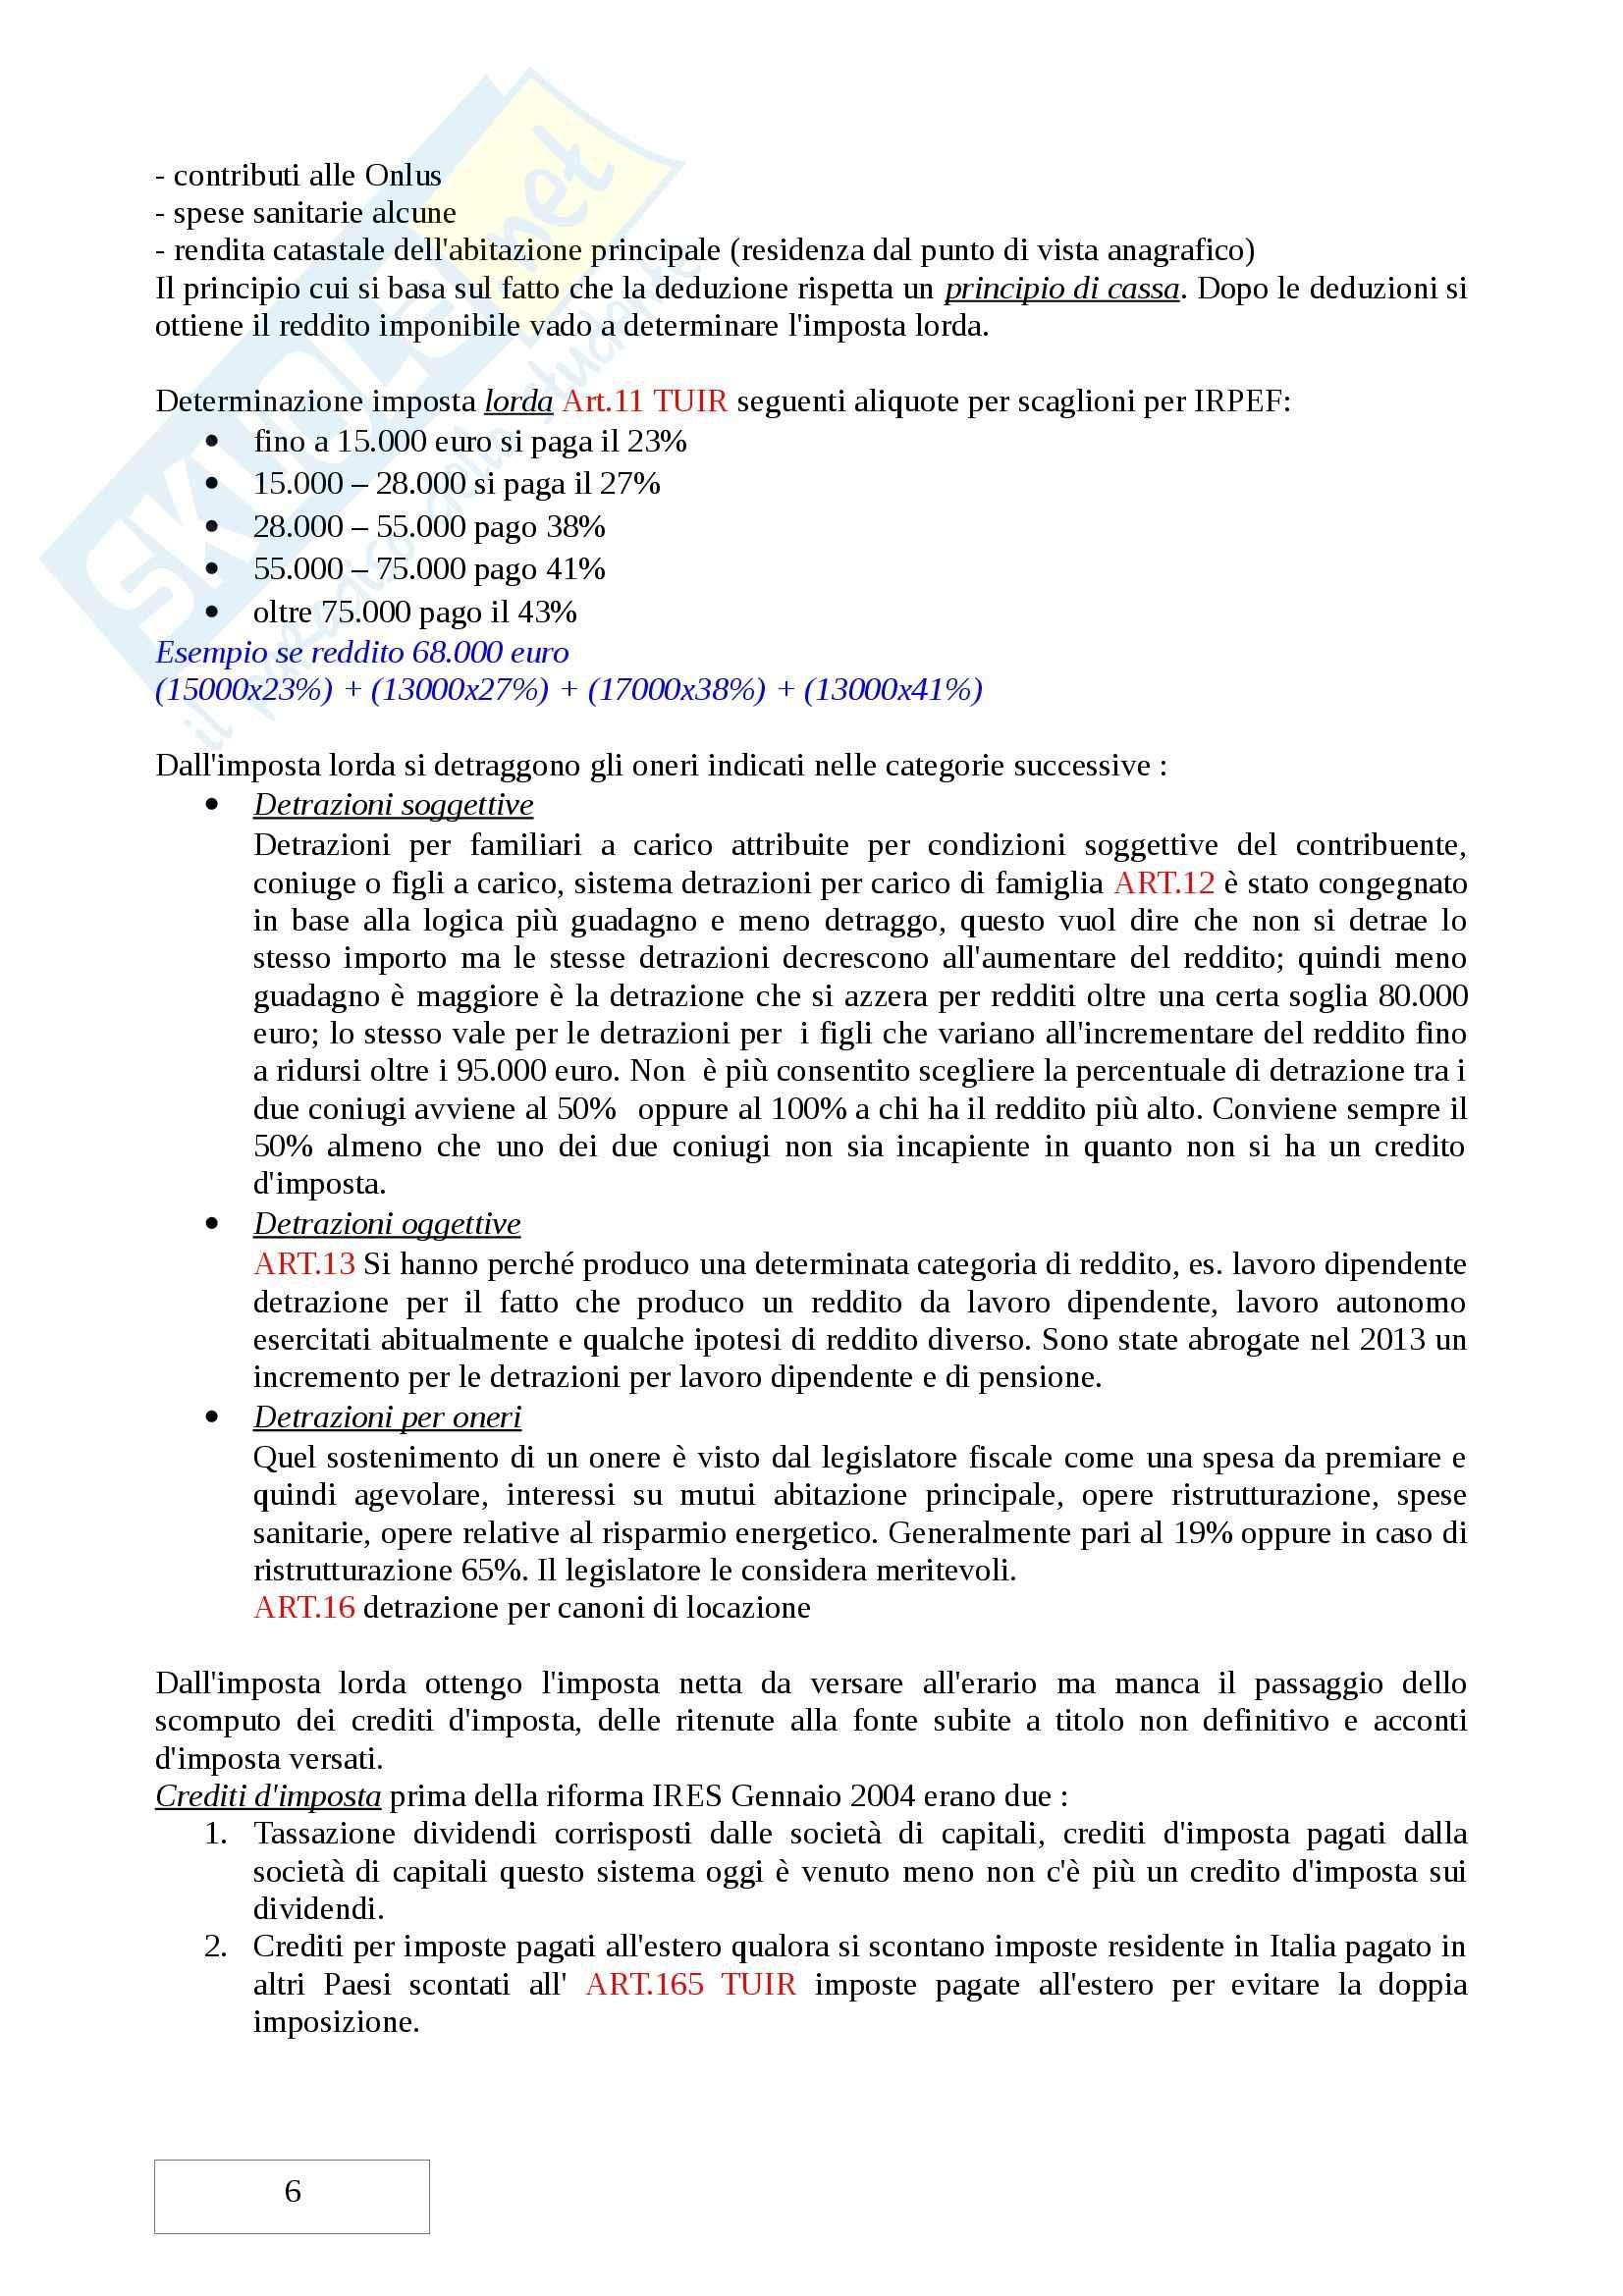 Secondo Parziale, Diritto tributario Pag. 6